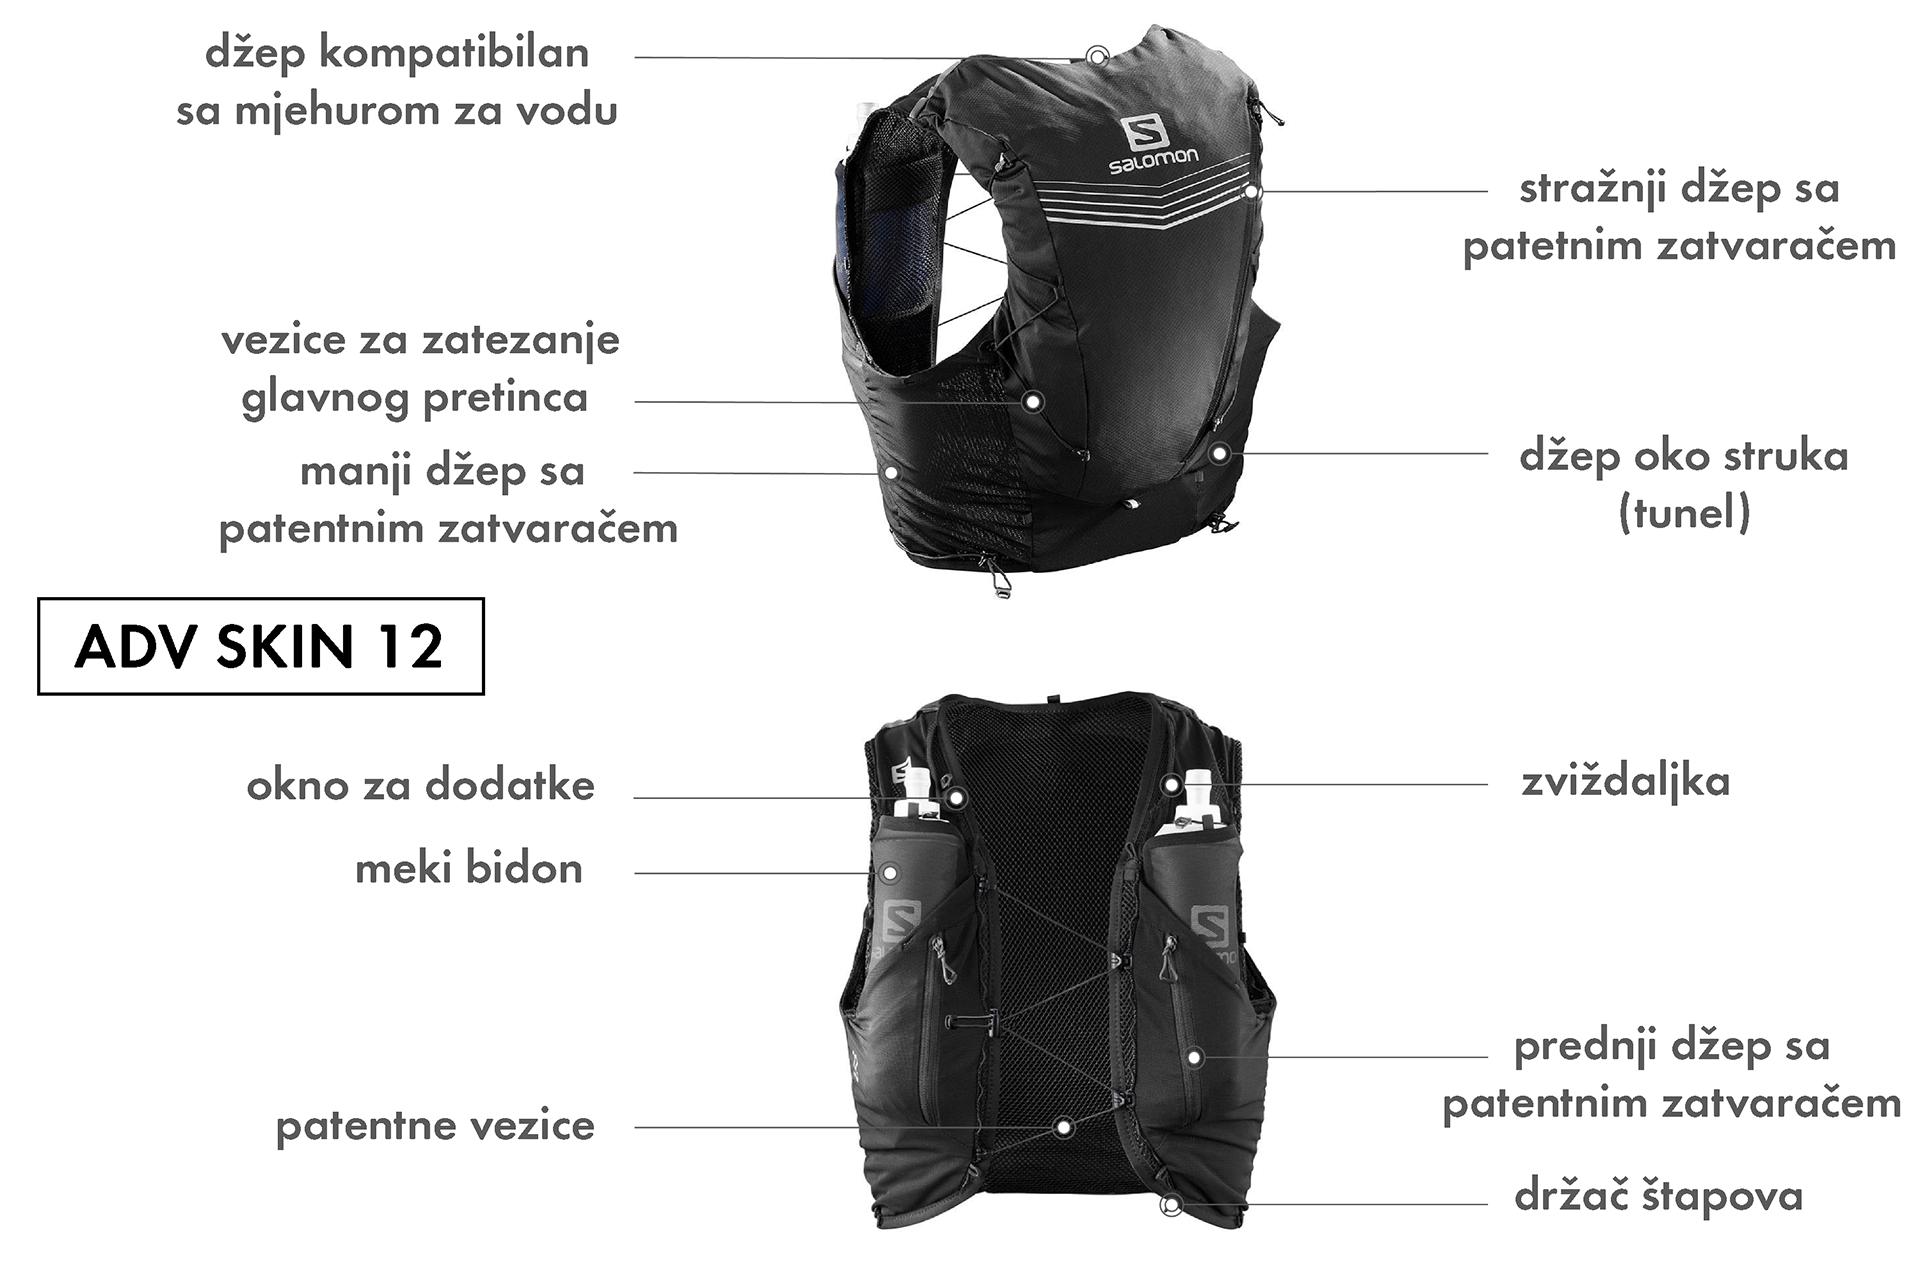 salomon adv skin ruksaci